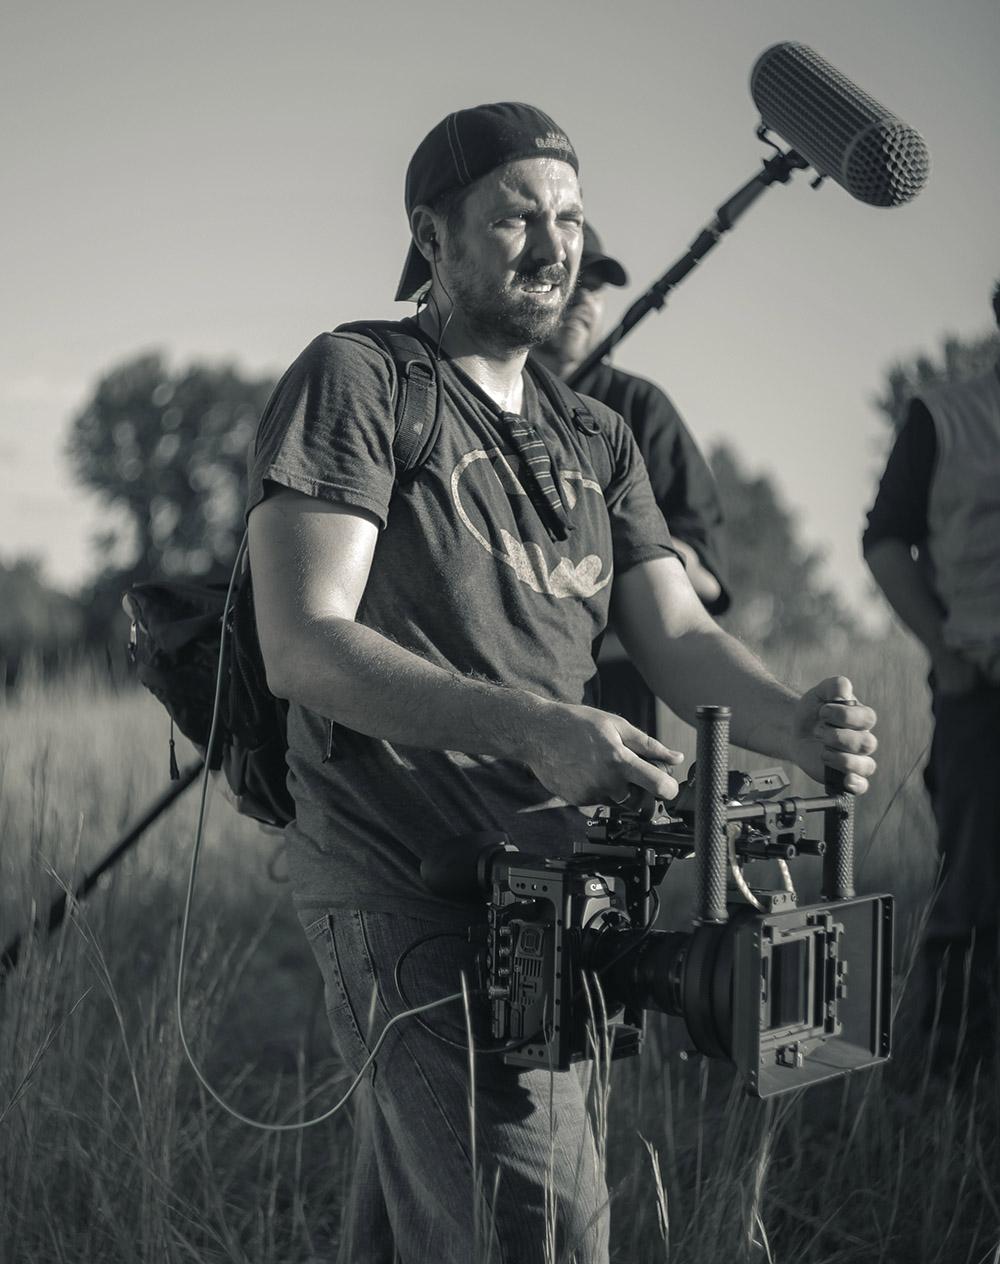 Ryan_Connolly,_From_Film_Riot,_Sep_2013.jpg